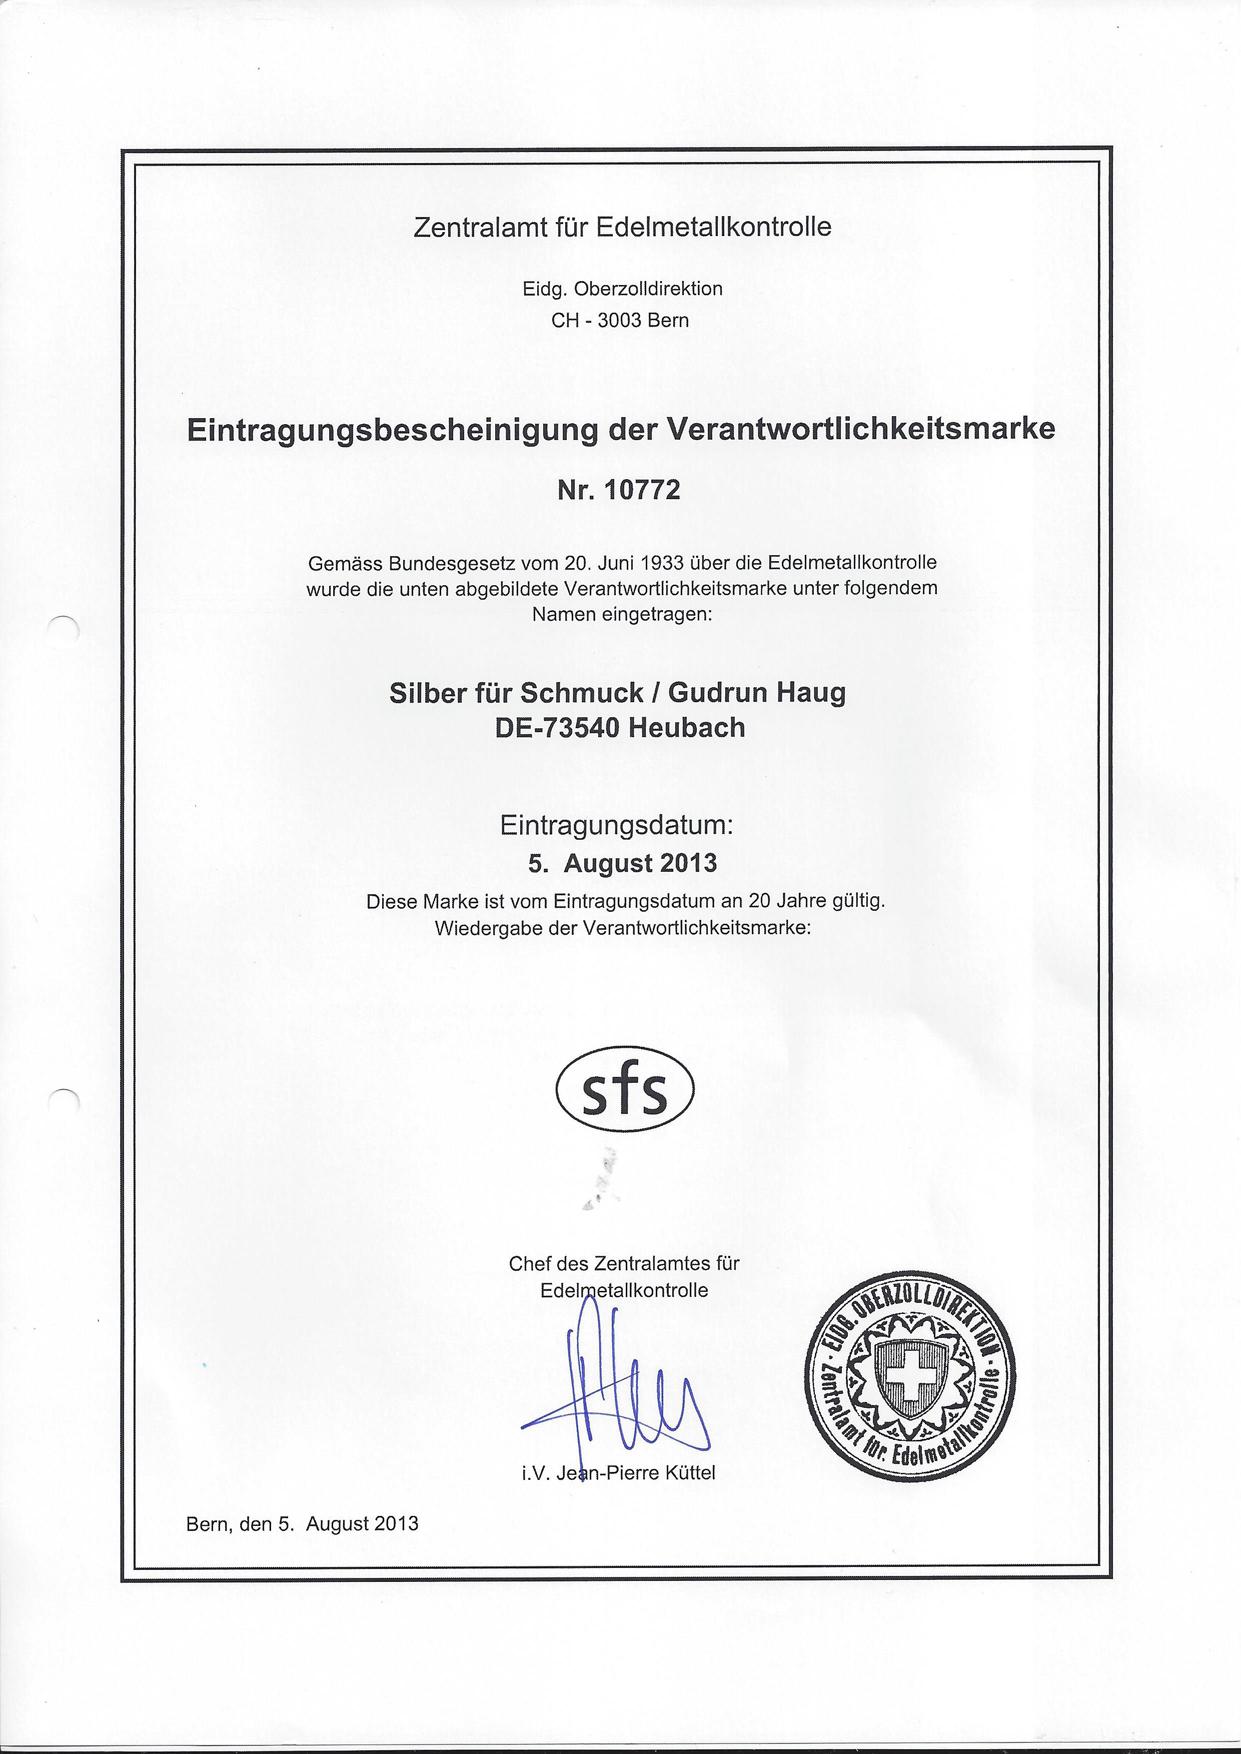 Zentralamt-f-r-Edelmetallkontrolle-klein